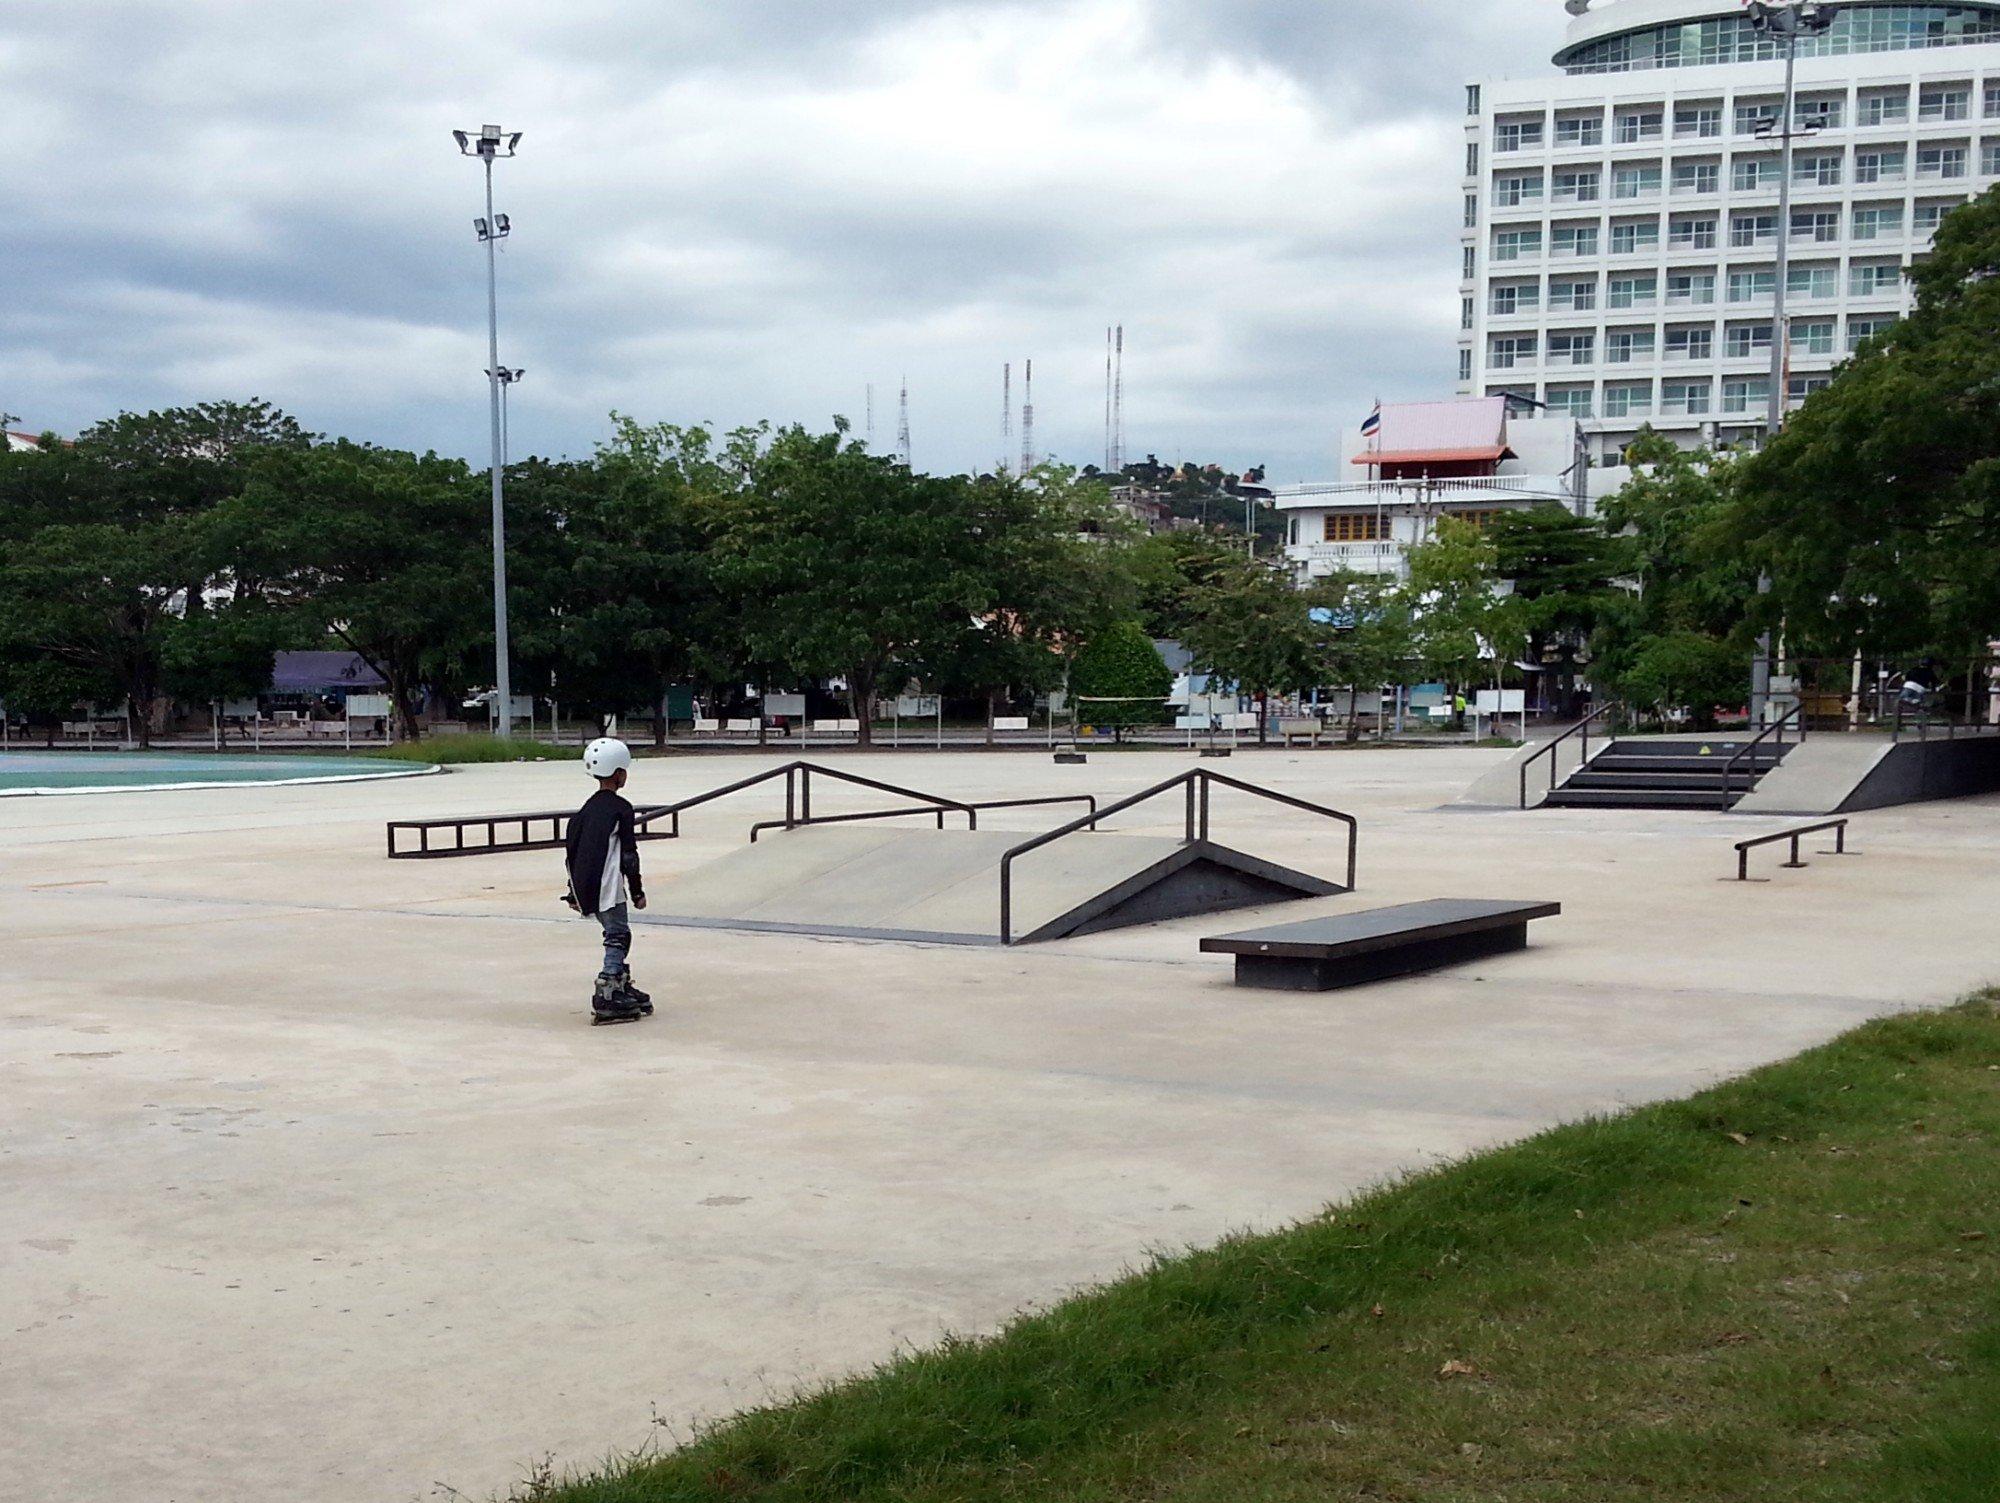 Skate park in Paradise Park